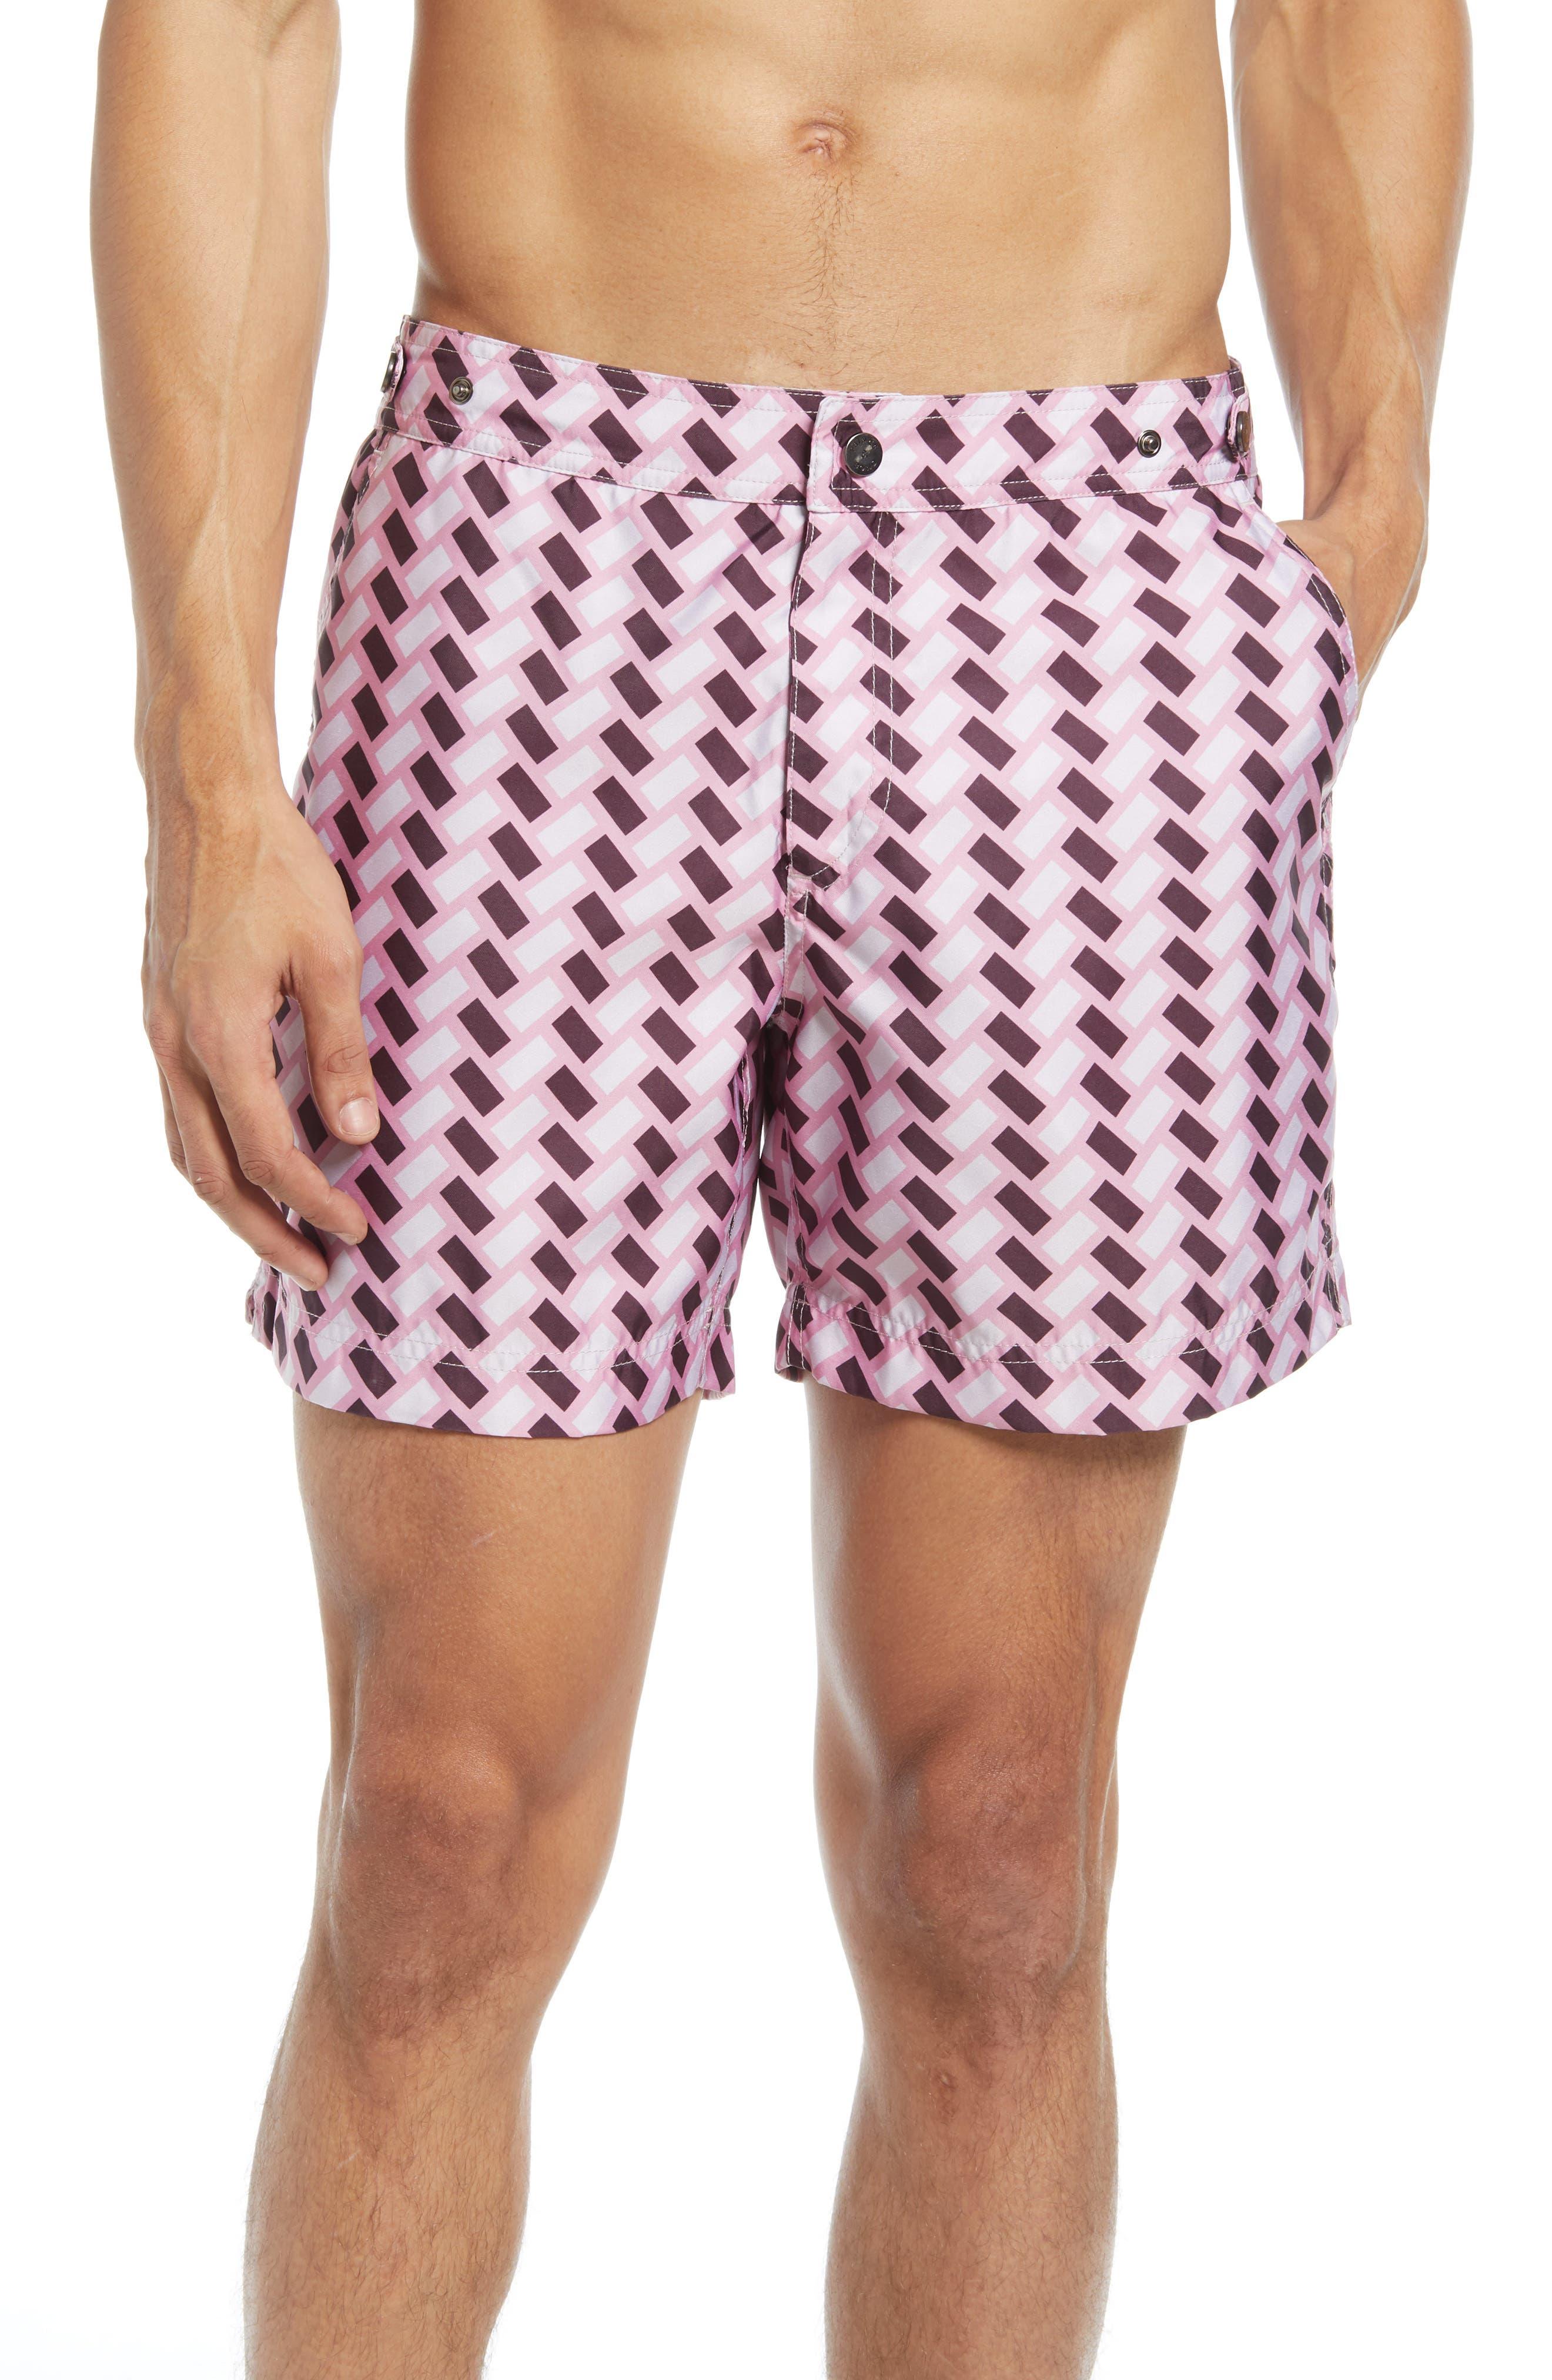 Vintage Men's Swimsuits – 1930s, 1940s, 1950s History Mens Prince  Bond Retro Tile Print Hybrid Nylon Swim Trunks Size 38 - Pink $175.00 AT vintagedancer.com